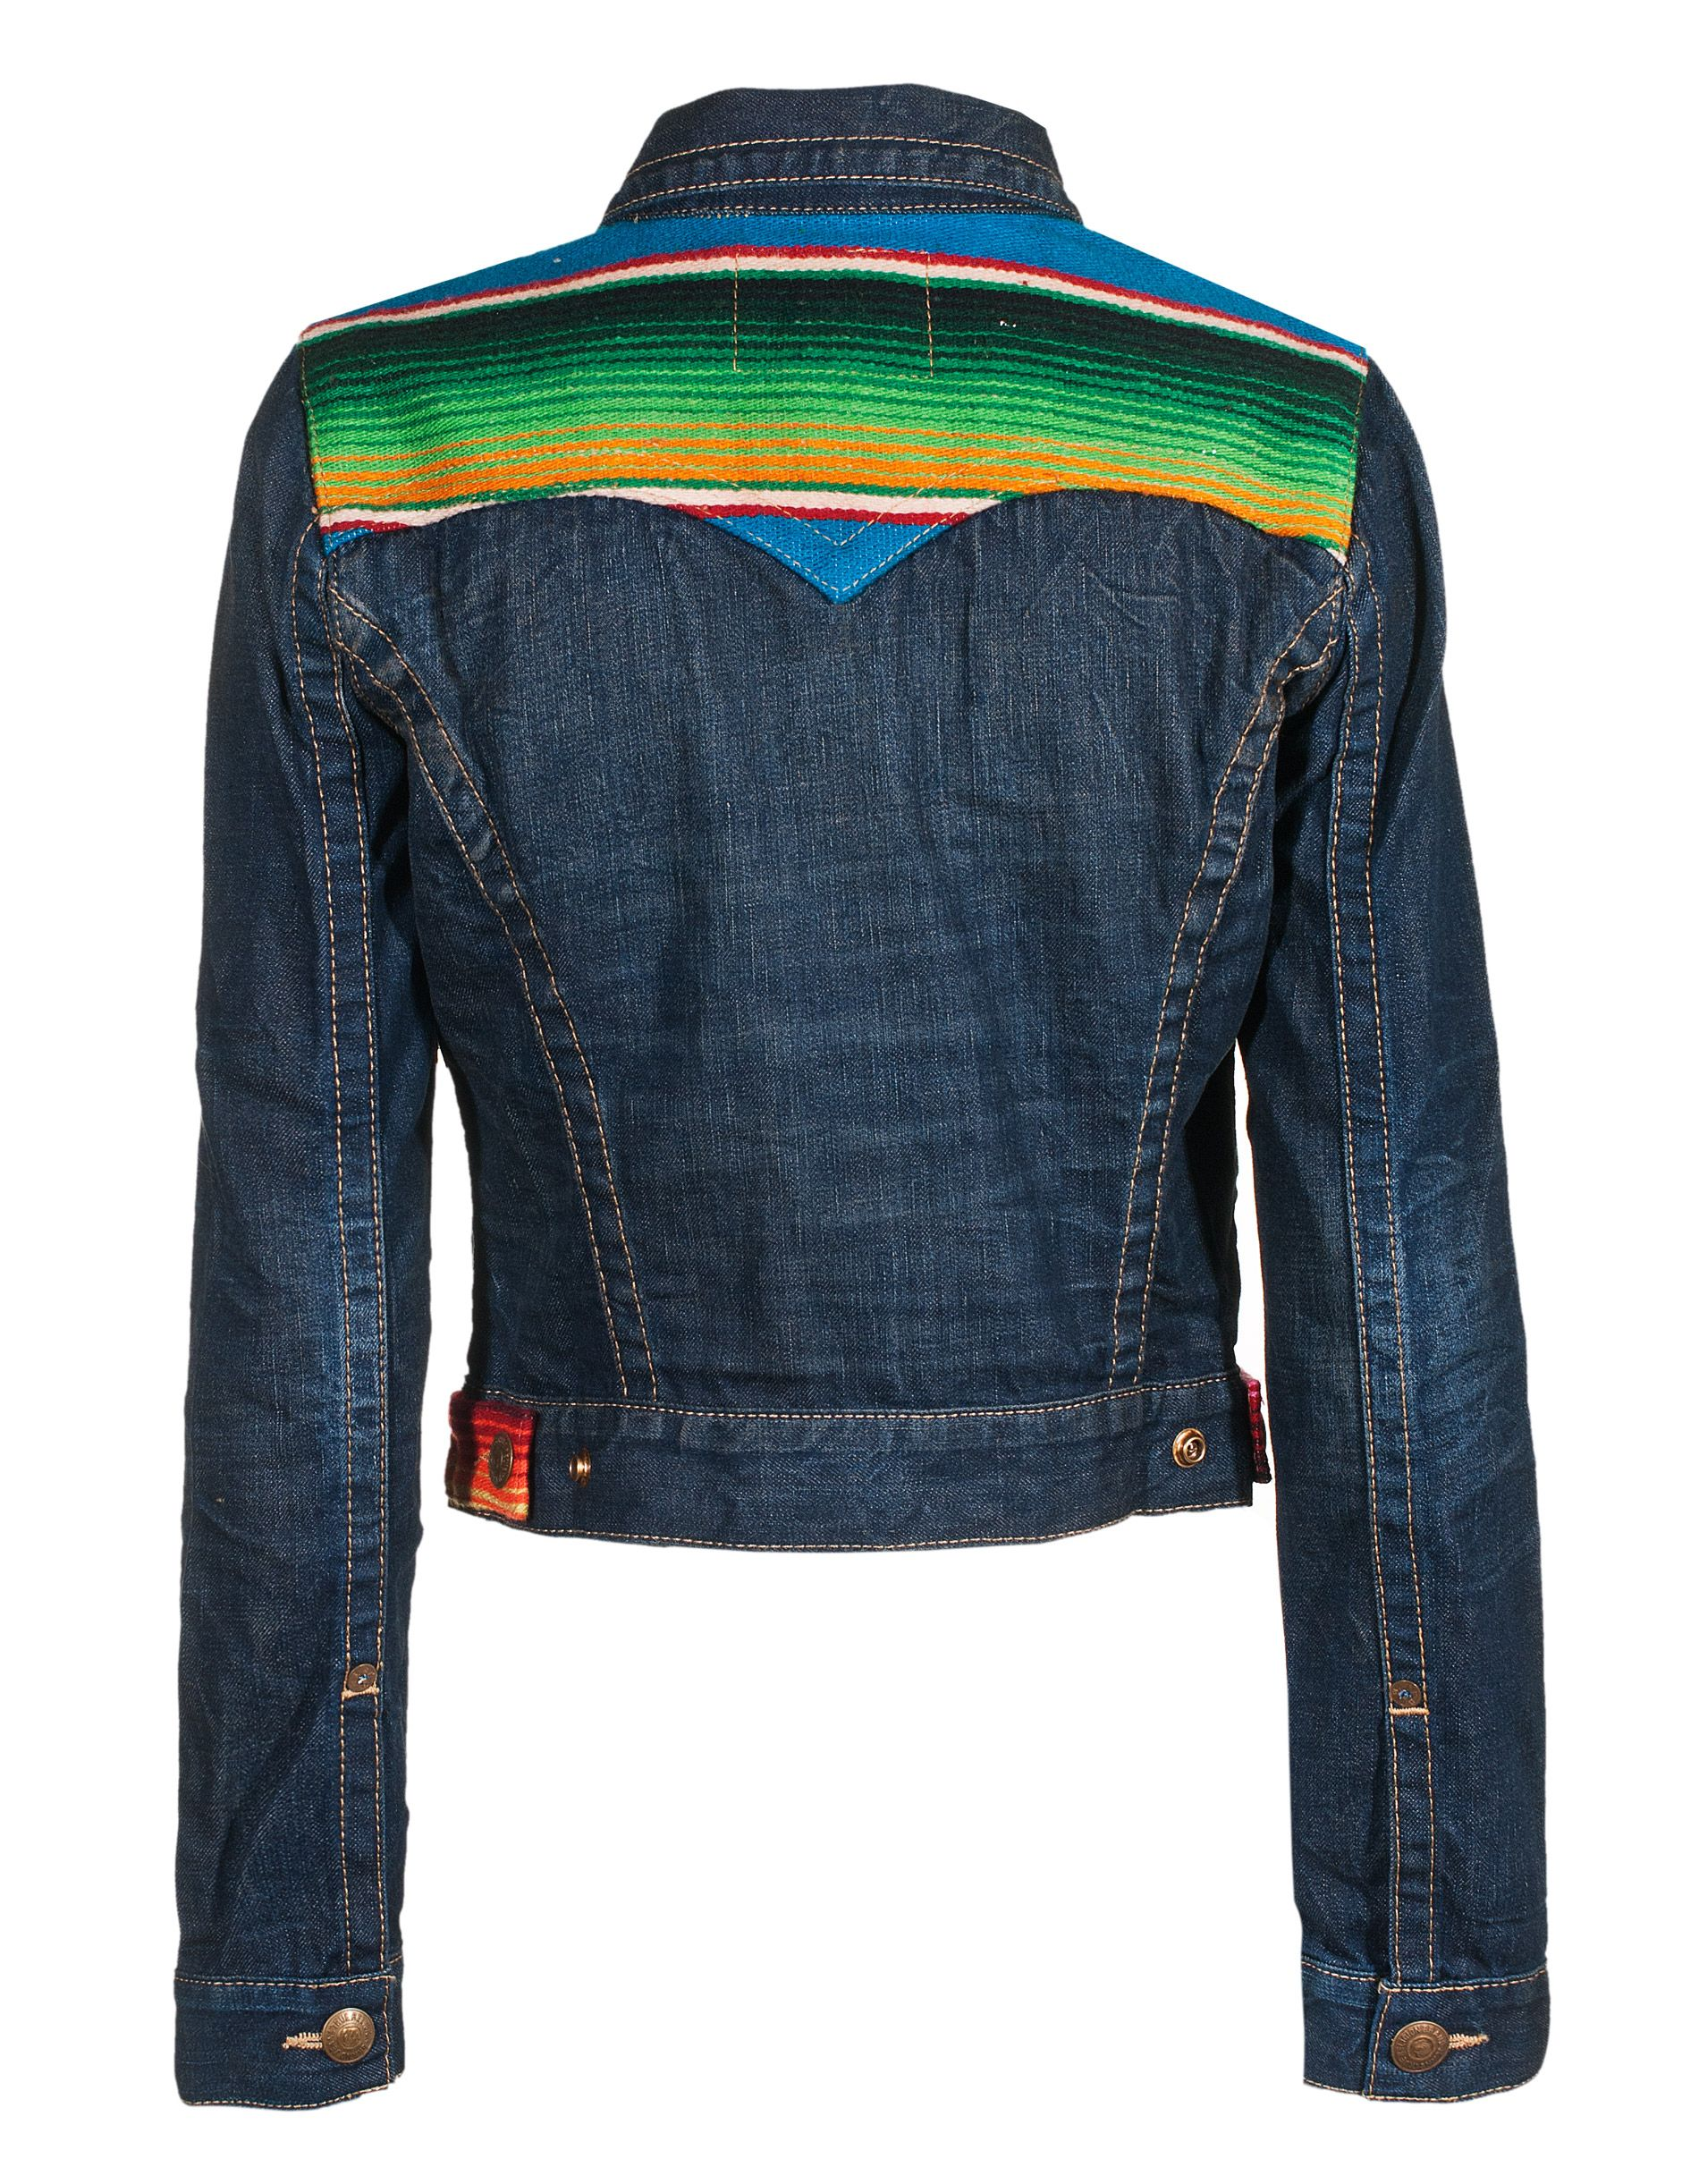 TRUE RELIGION Jada Baja Retro Iron Horse Patterned denim jacket - Jackets & Coats